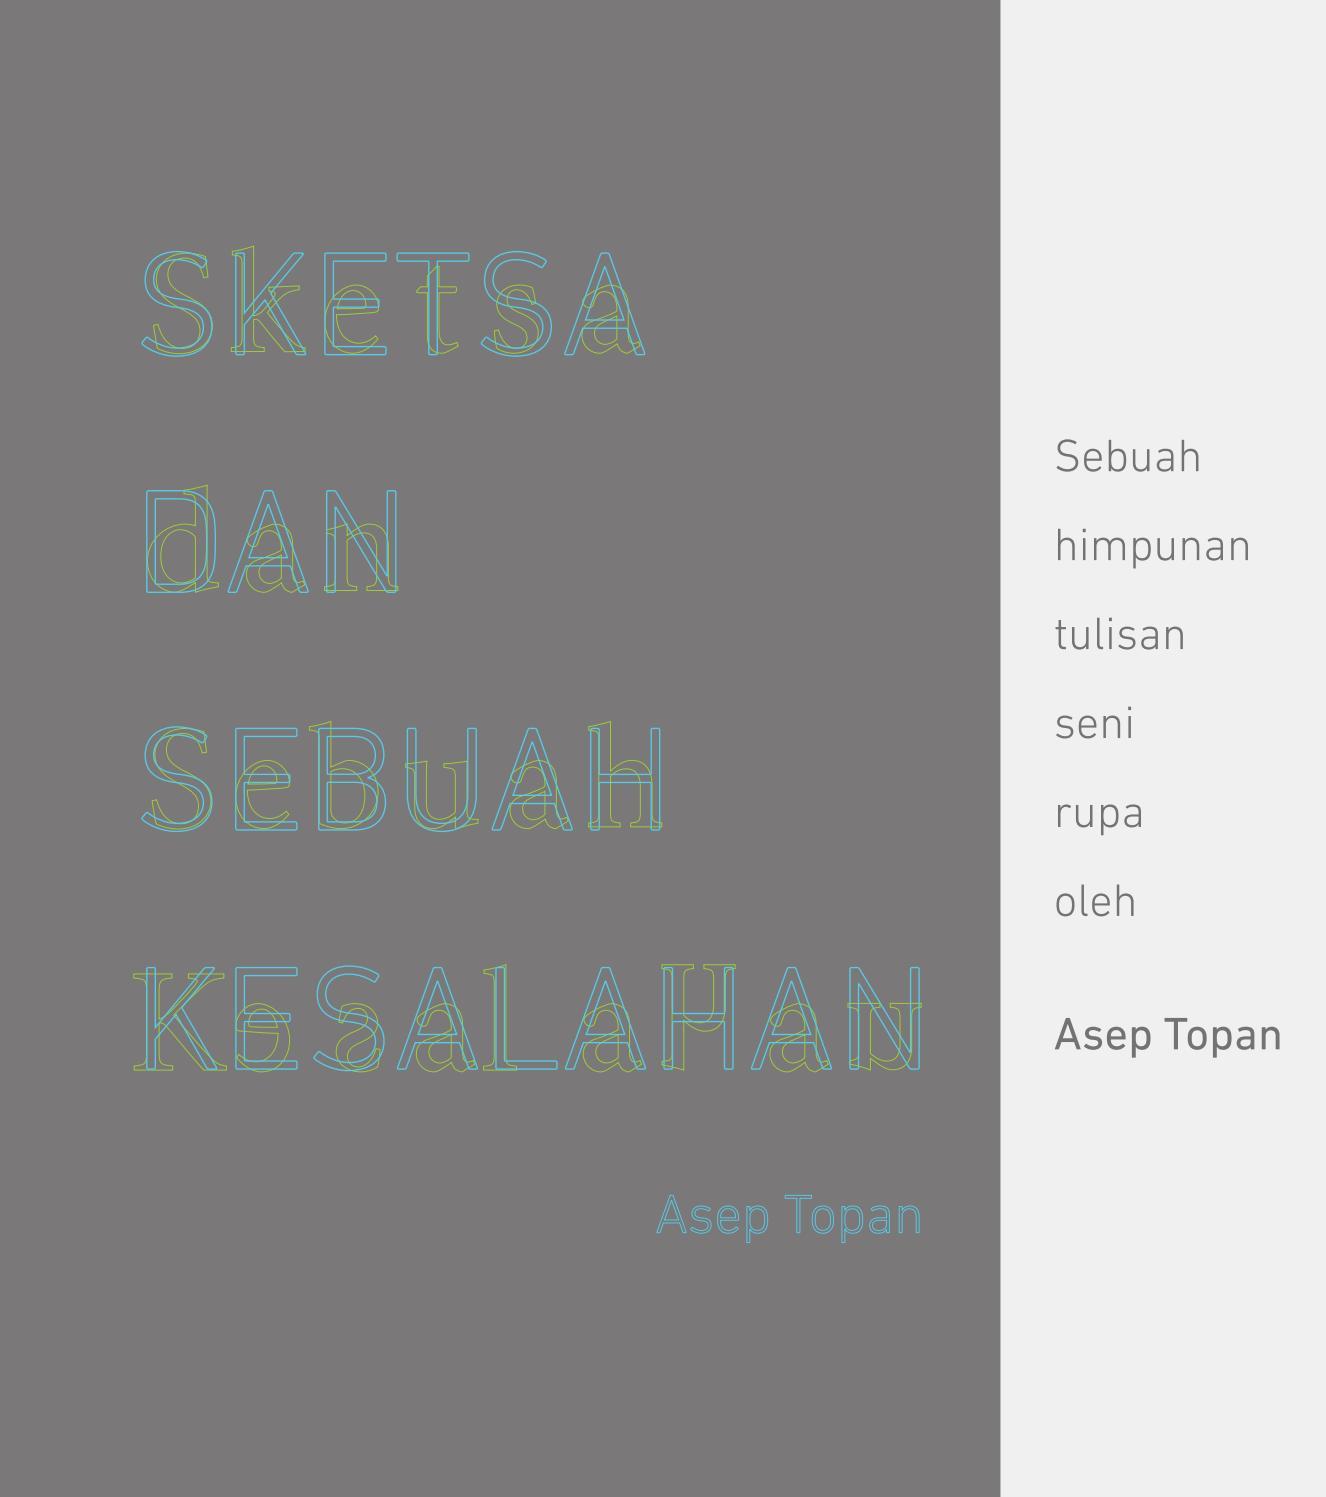 Sketsa Dan Sebuah Kesalahan By Asep Topan Issuu